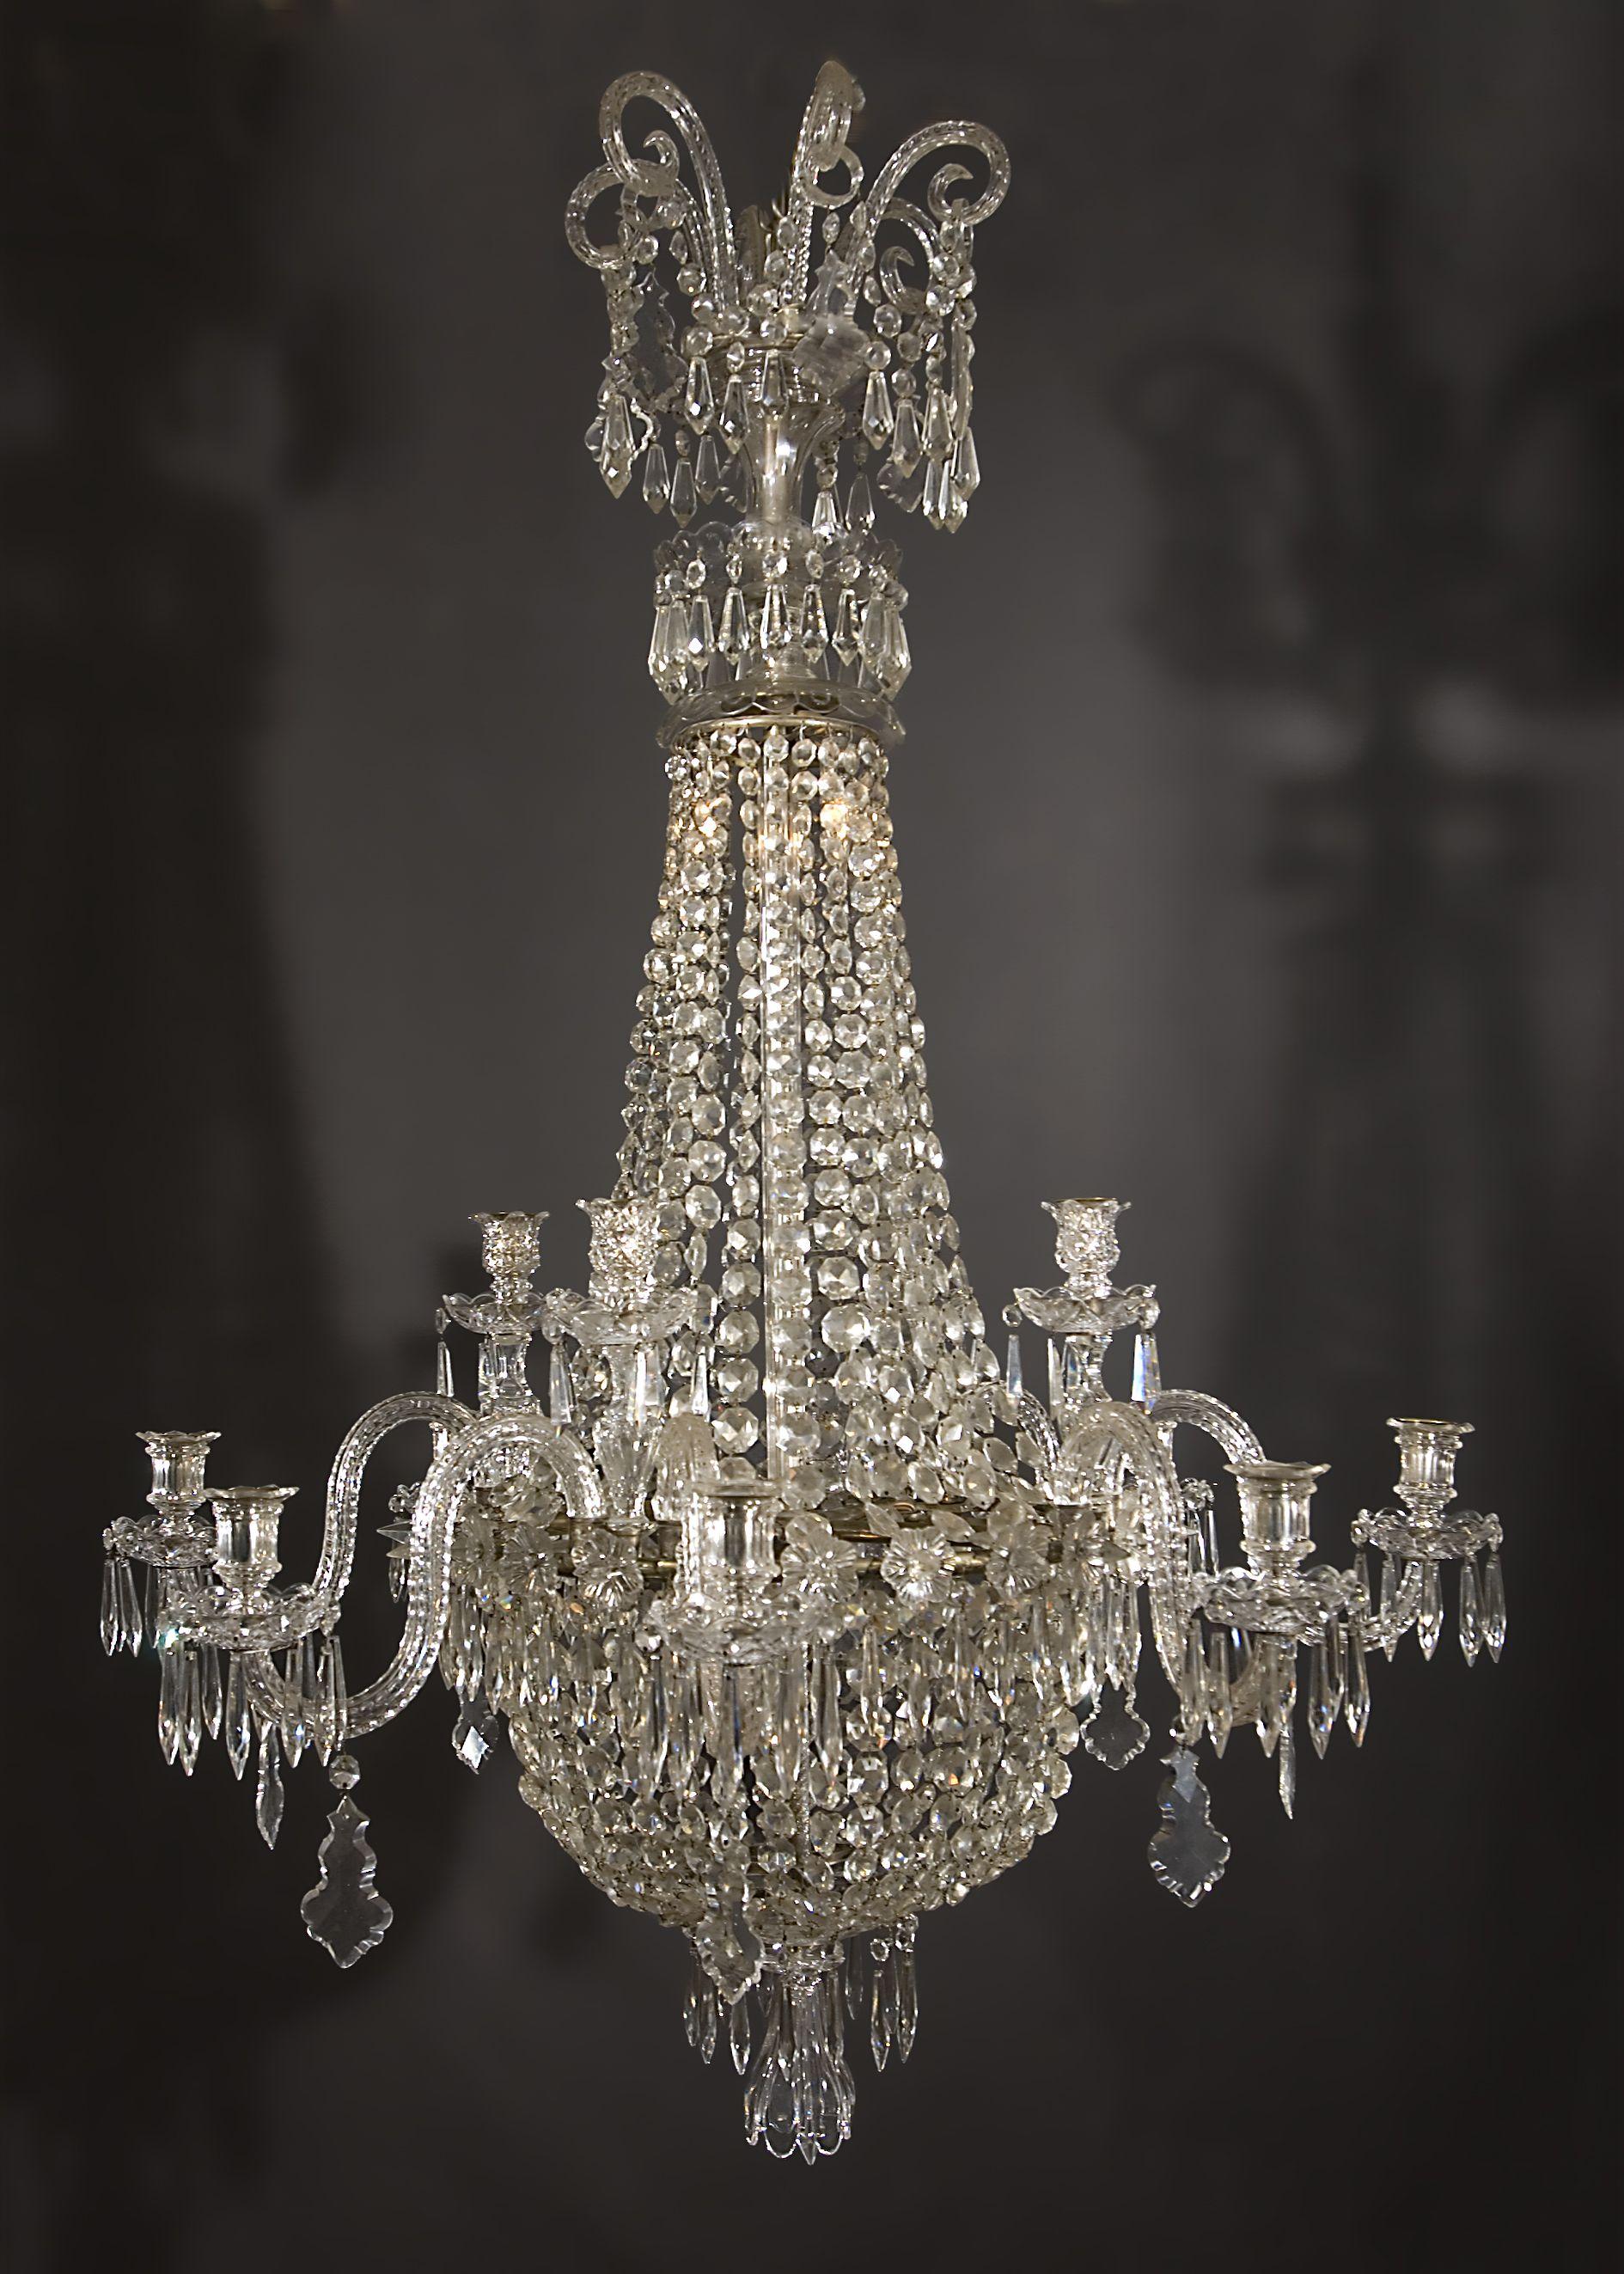 Baccarat chandelier chandelier luv xoxo pinterest baccarat chandelier arubaitofo Choice Image